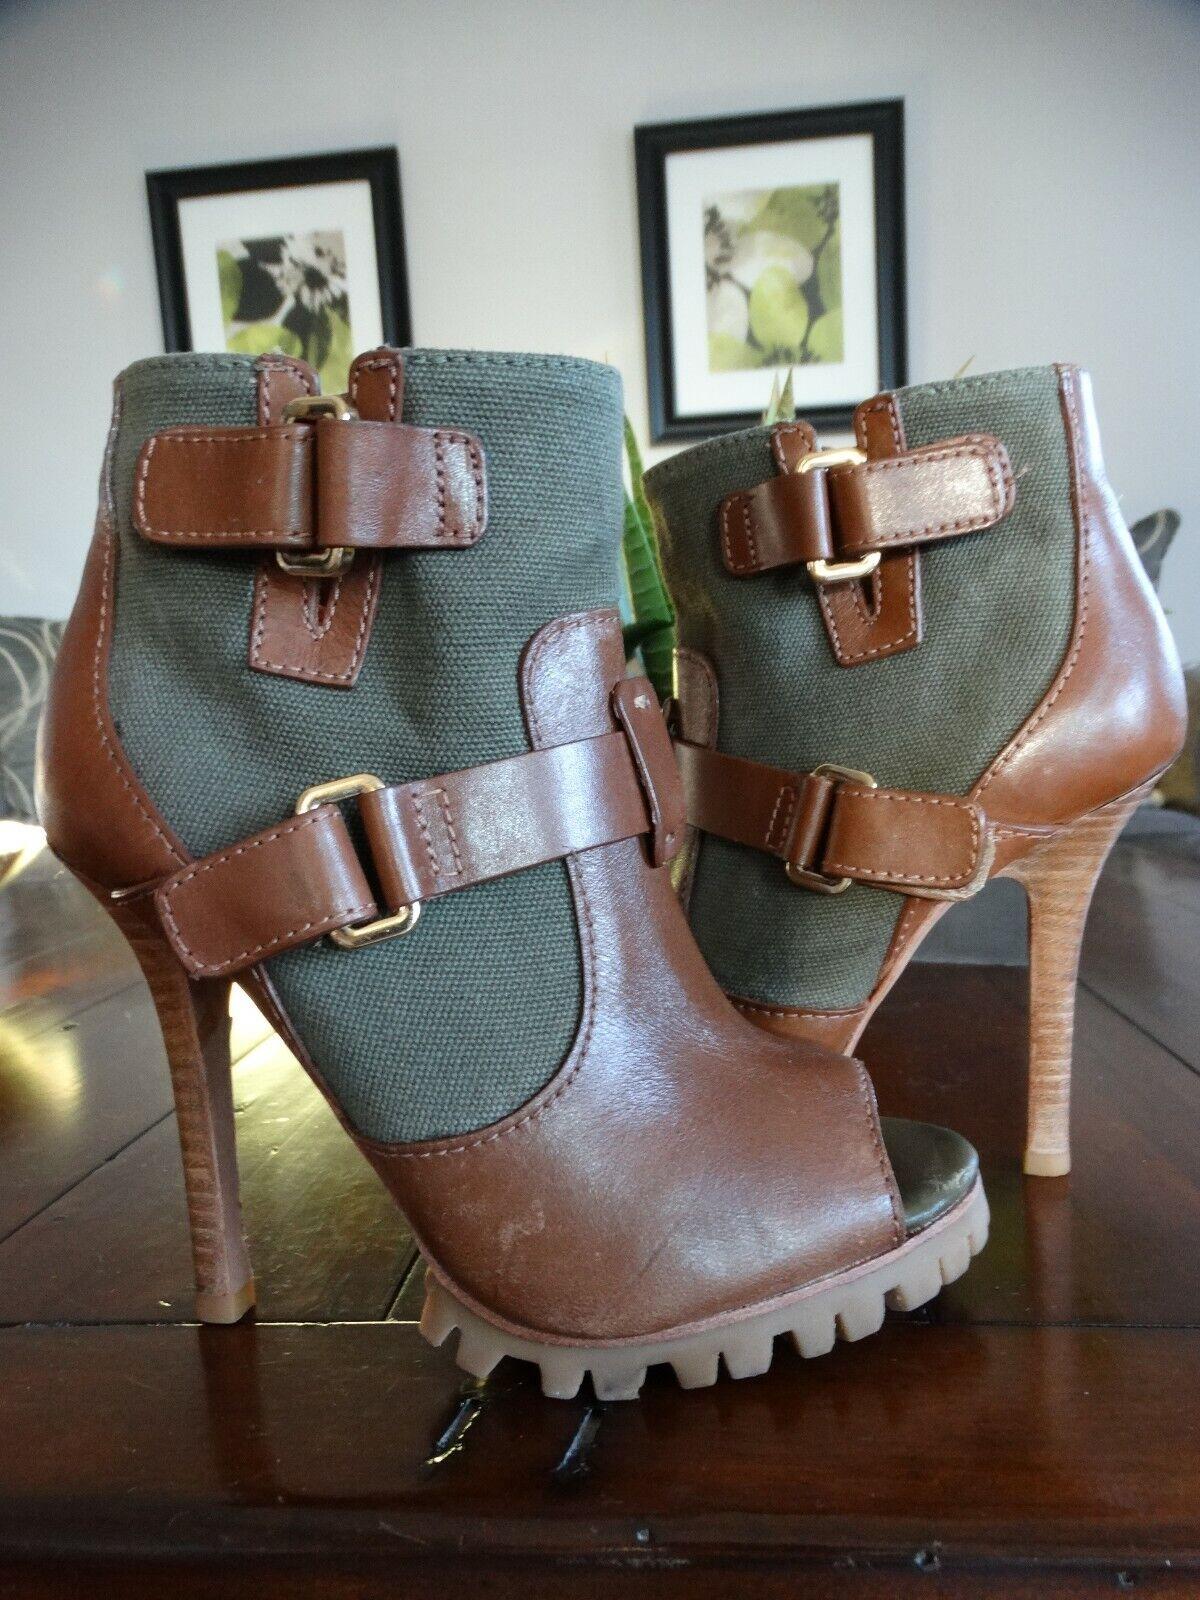 TORY BURCH Oren Open toe Leather & Canvas Bootie 5.5